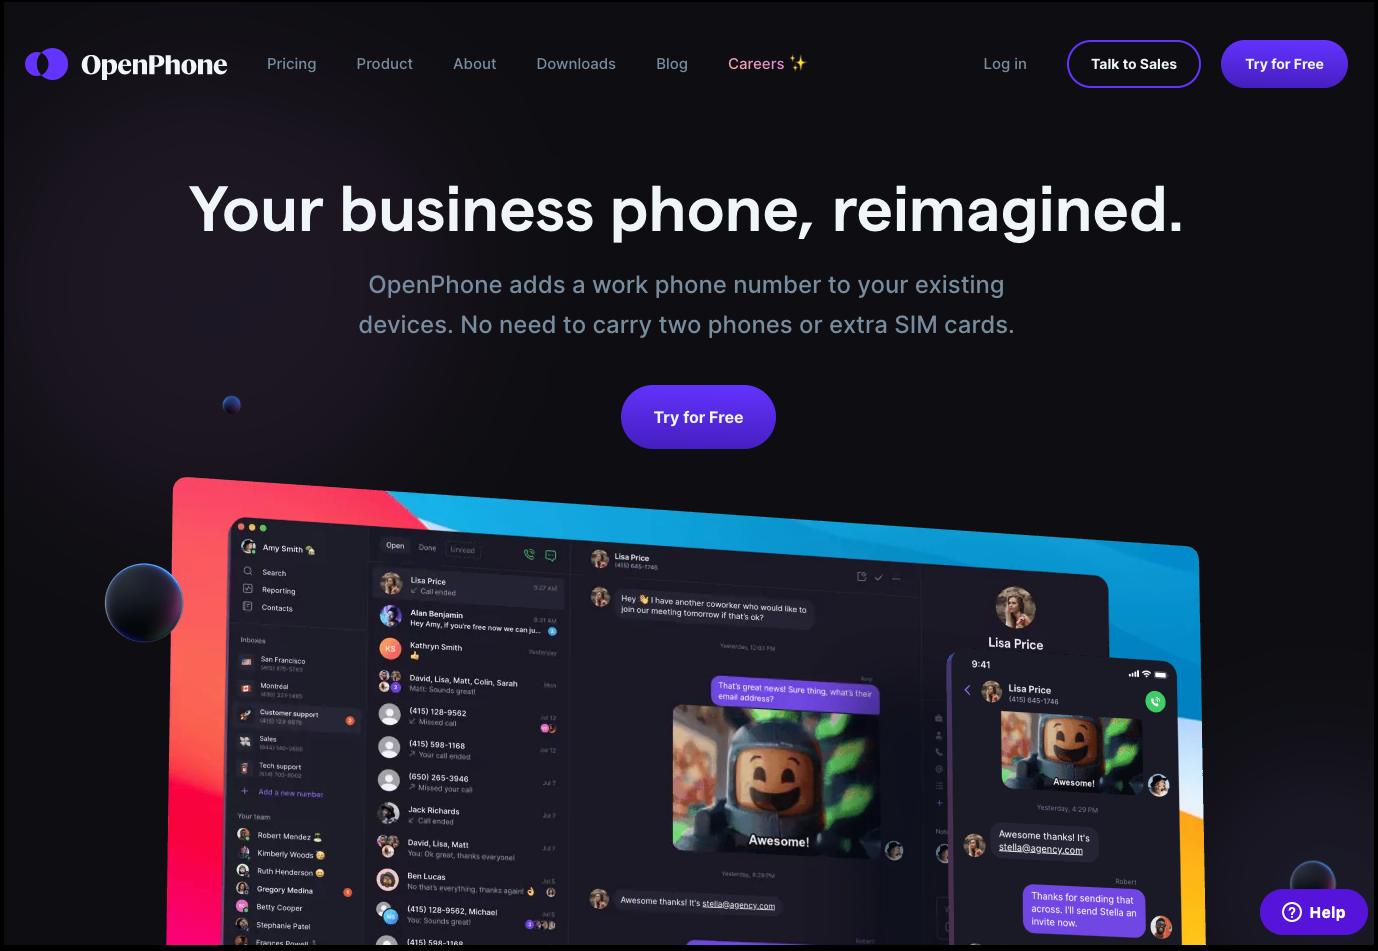 OpenPhone's homepage